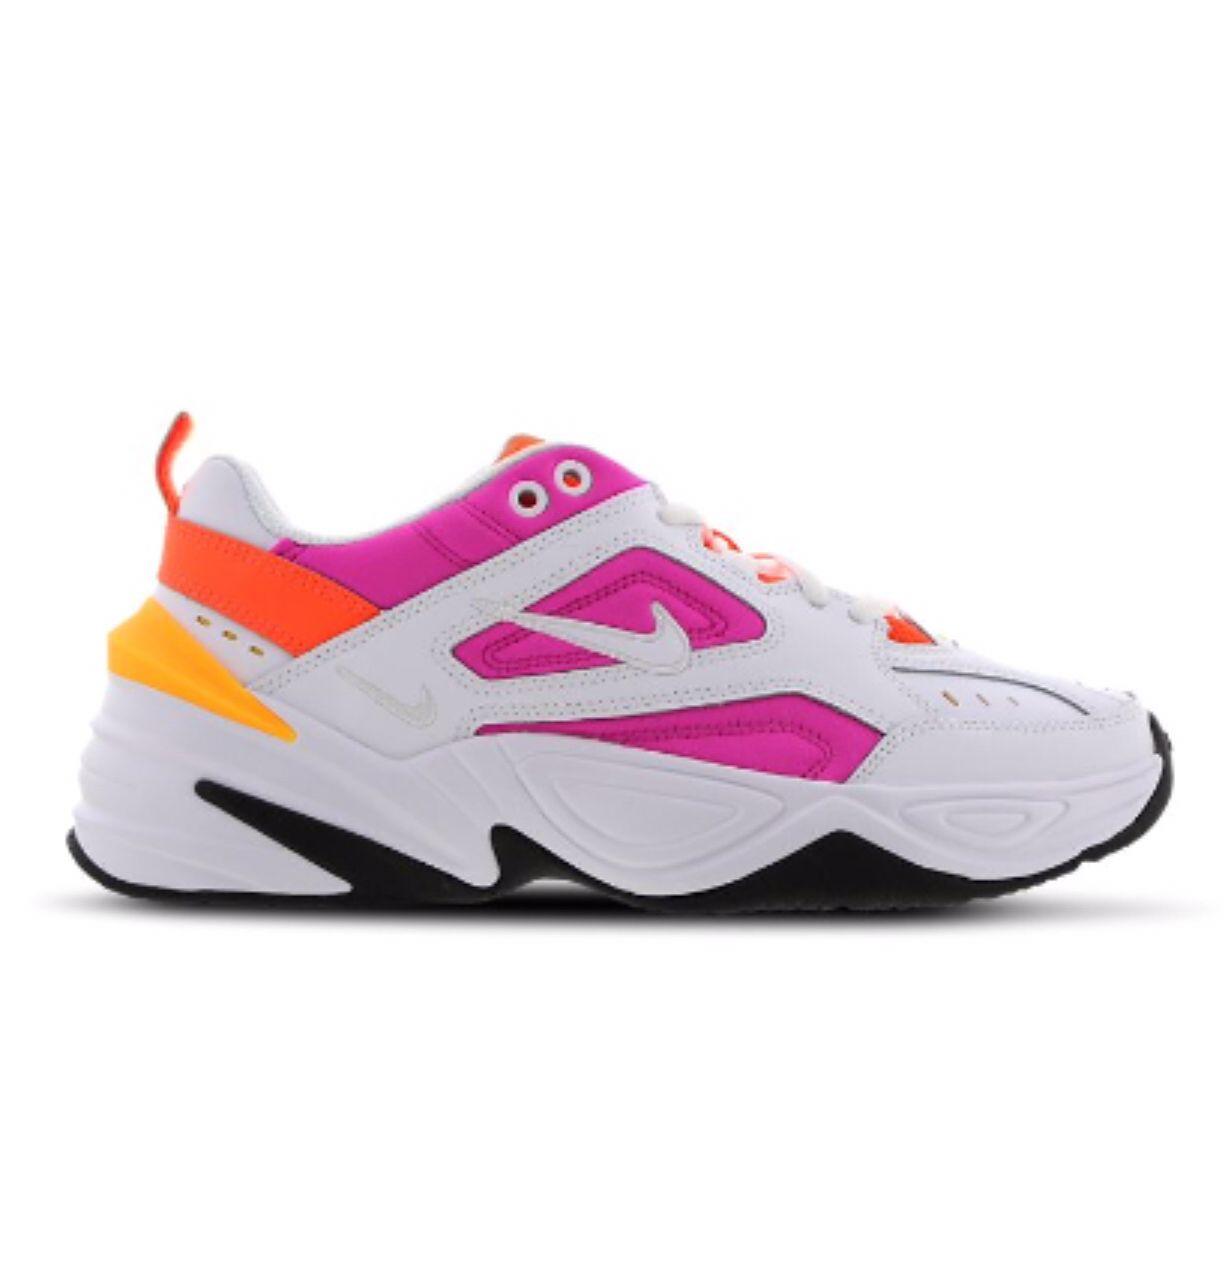 Nike M2K Tekno Sneakers, Brooks sneaker, Saucony sneaker